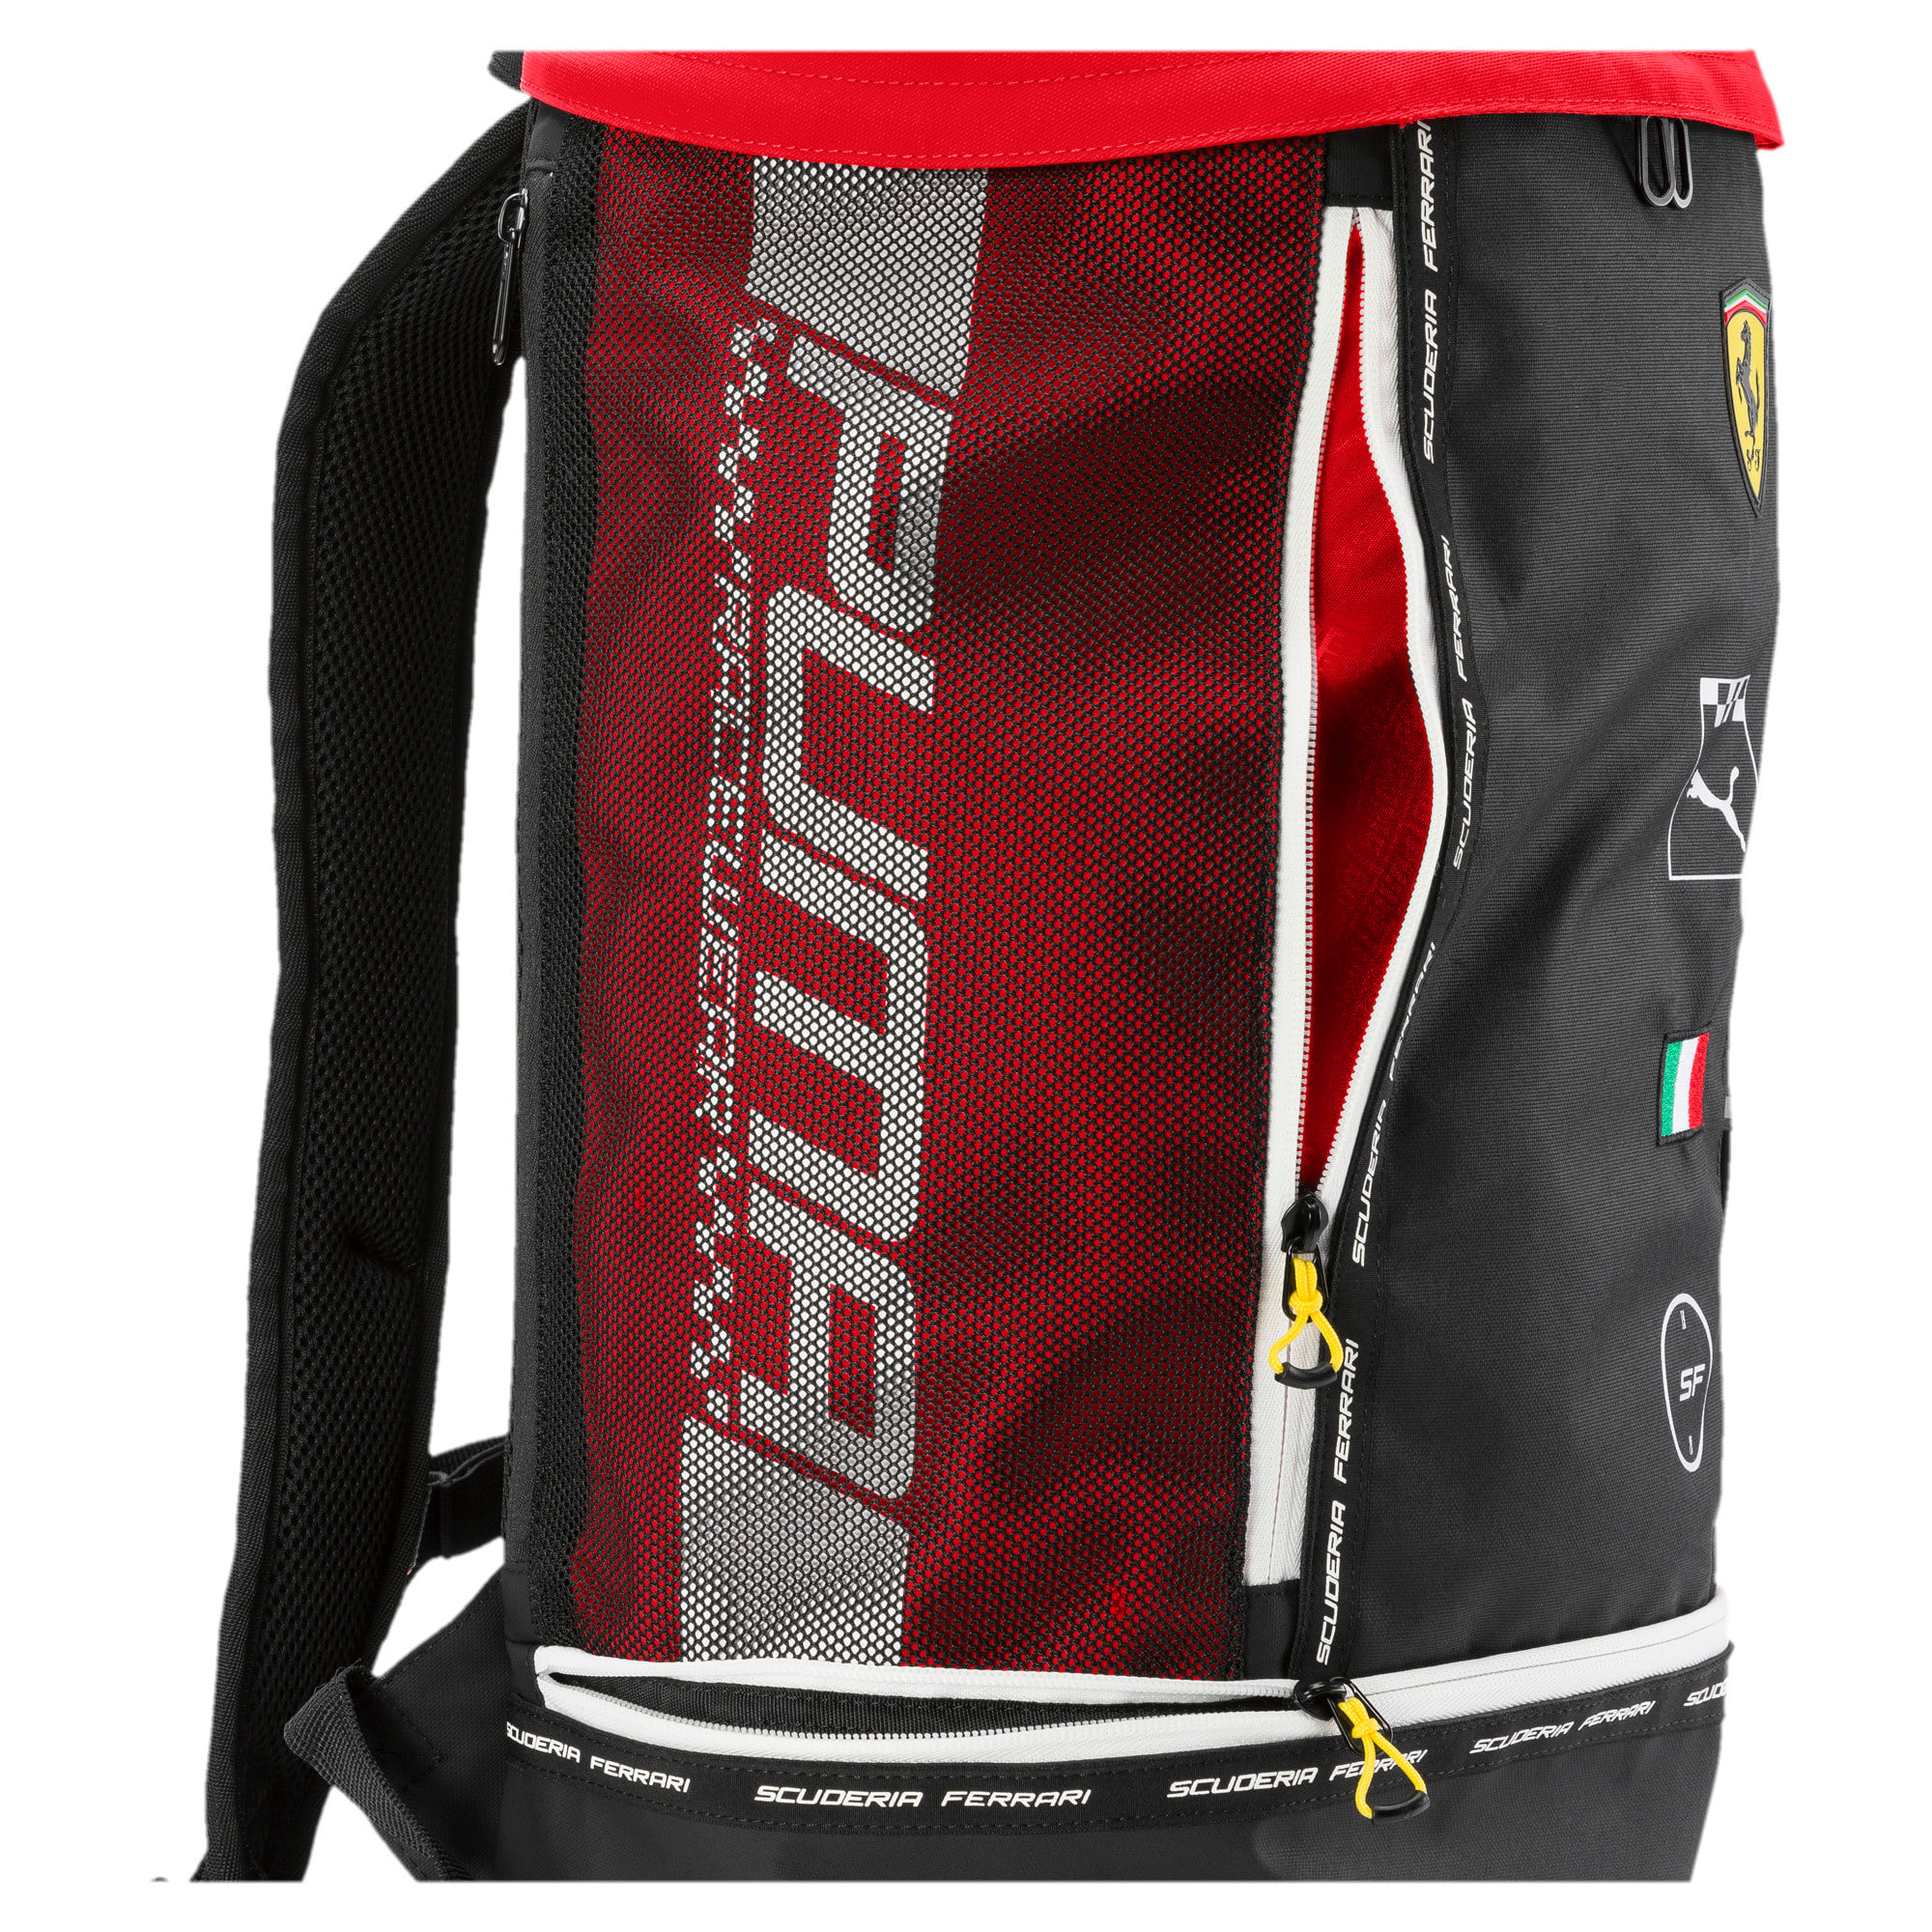 Thumbnail 4 of Ferrari Fanwear RCT Backpack, Rosso Corsa, medium